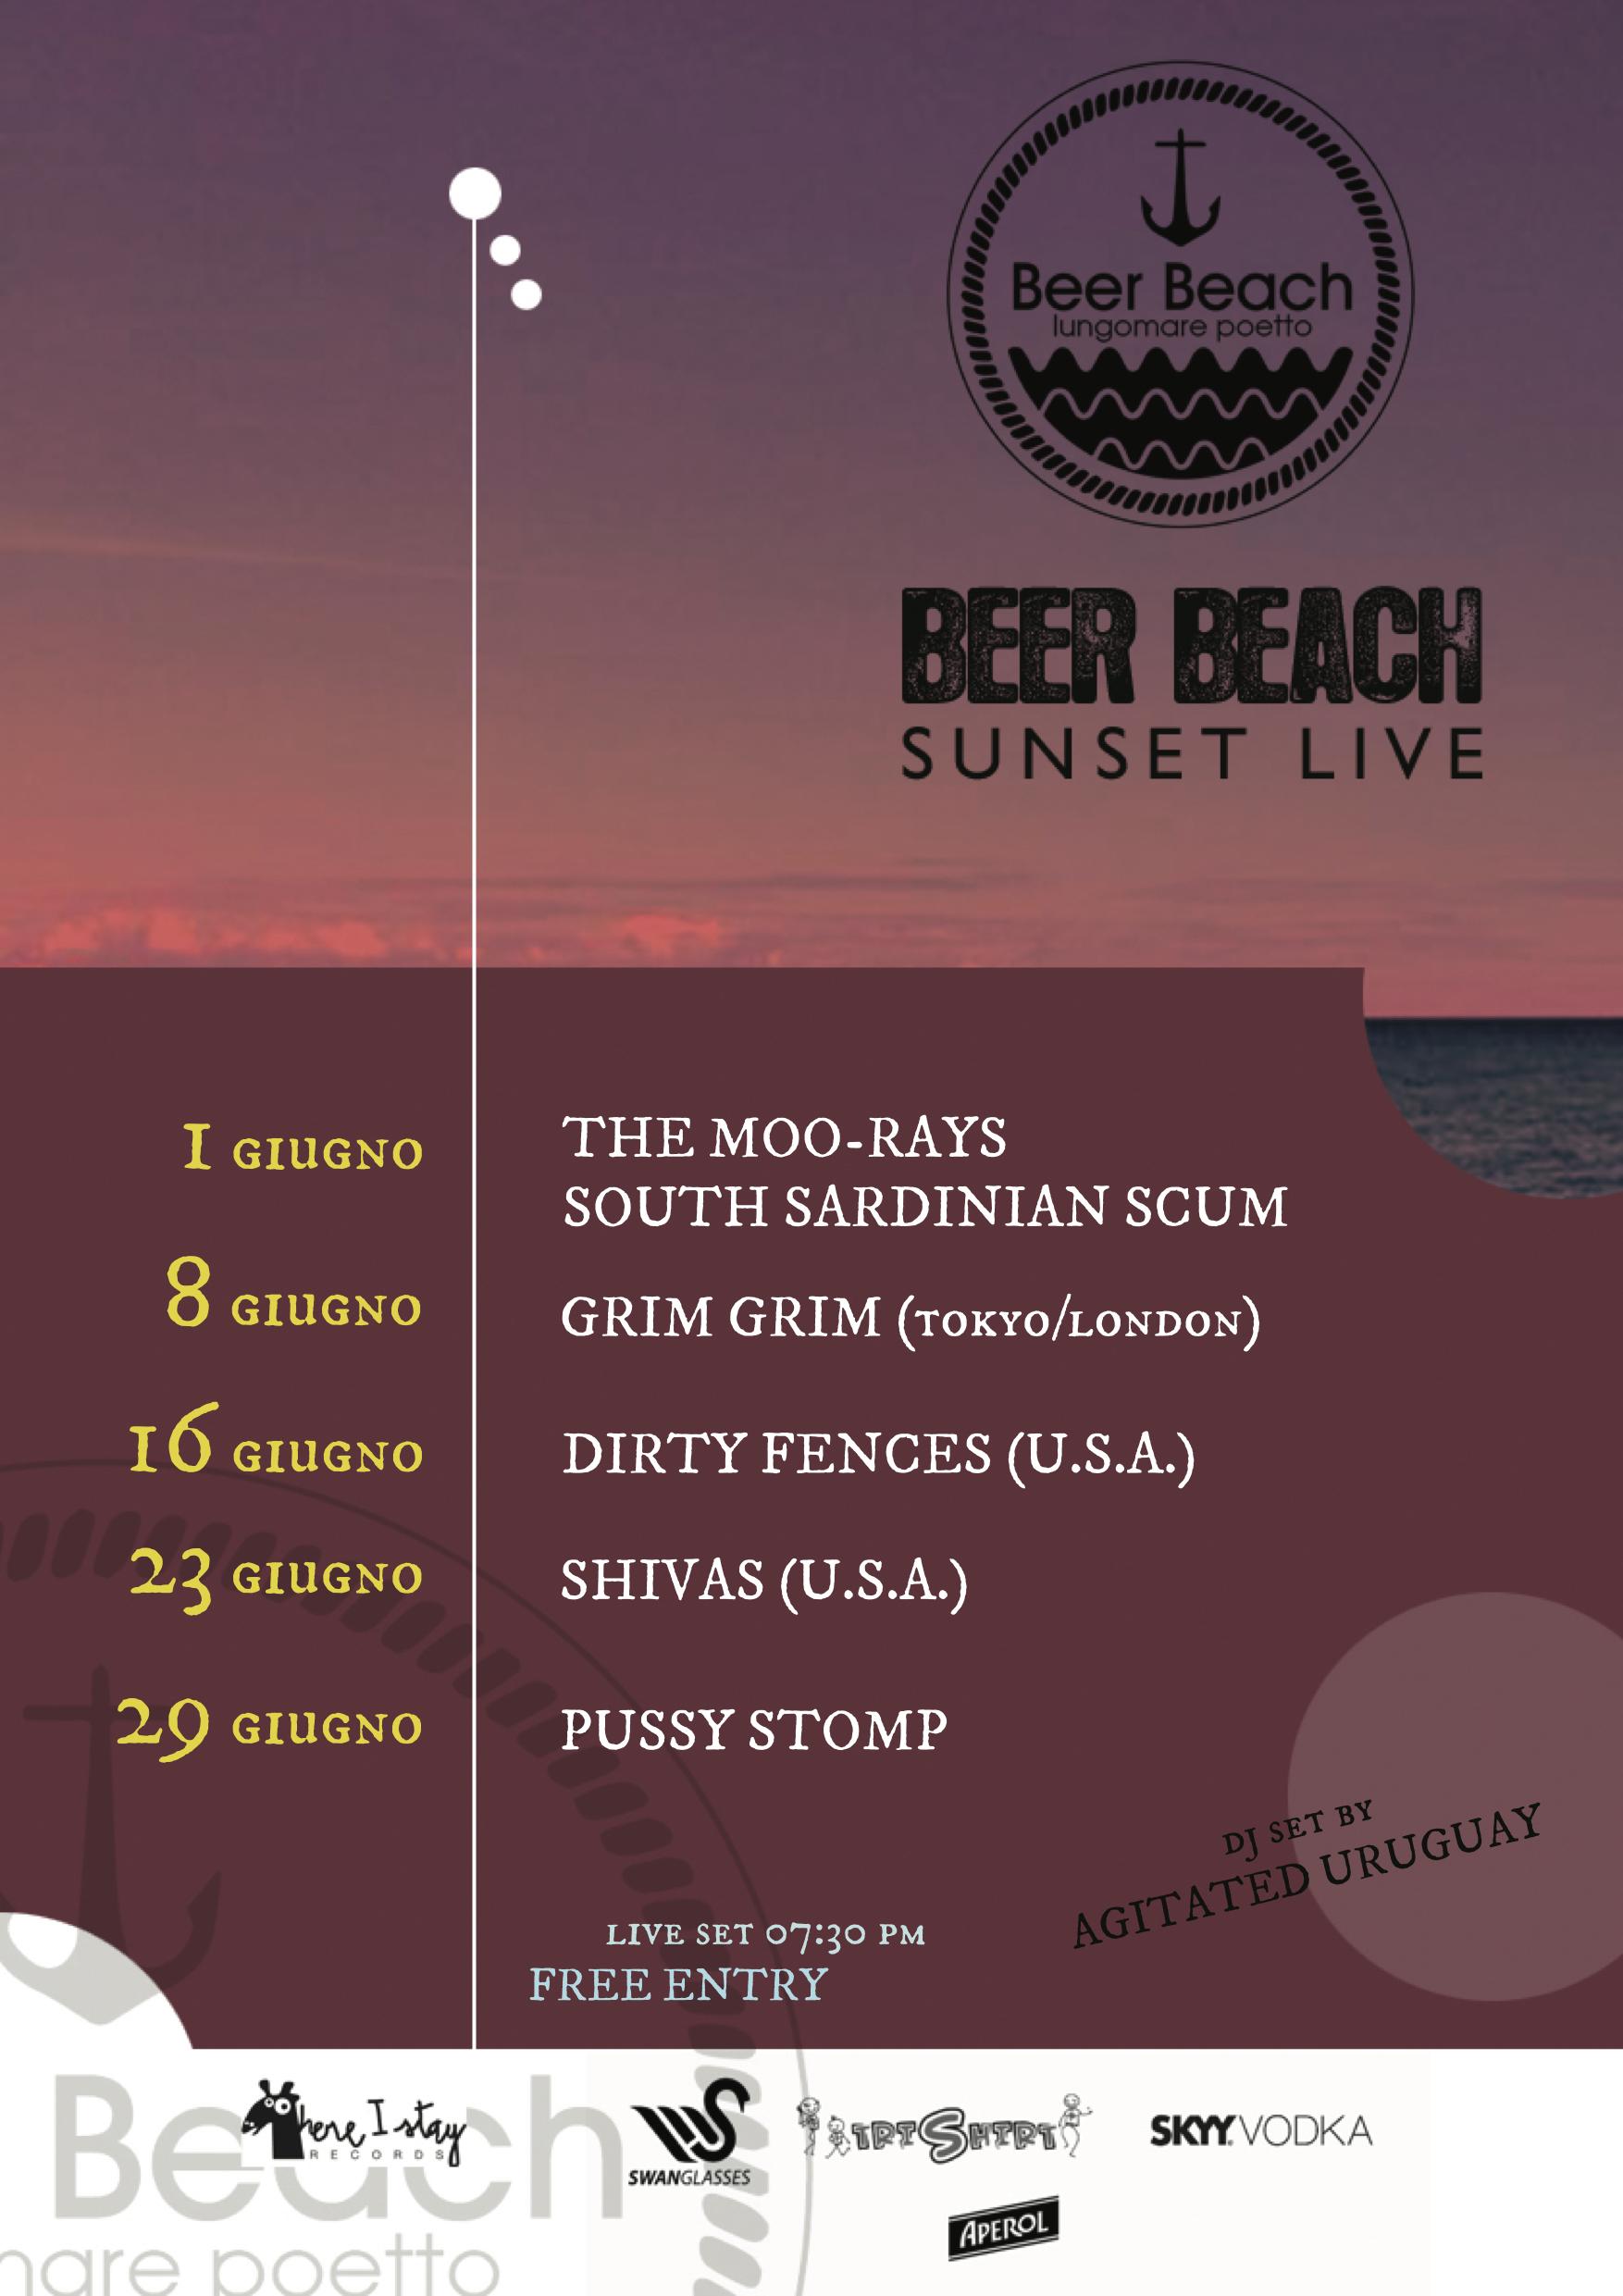 Beer Beach SUNSET LIVE